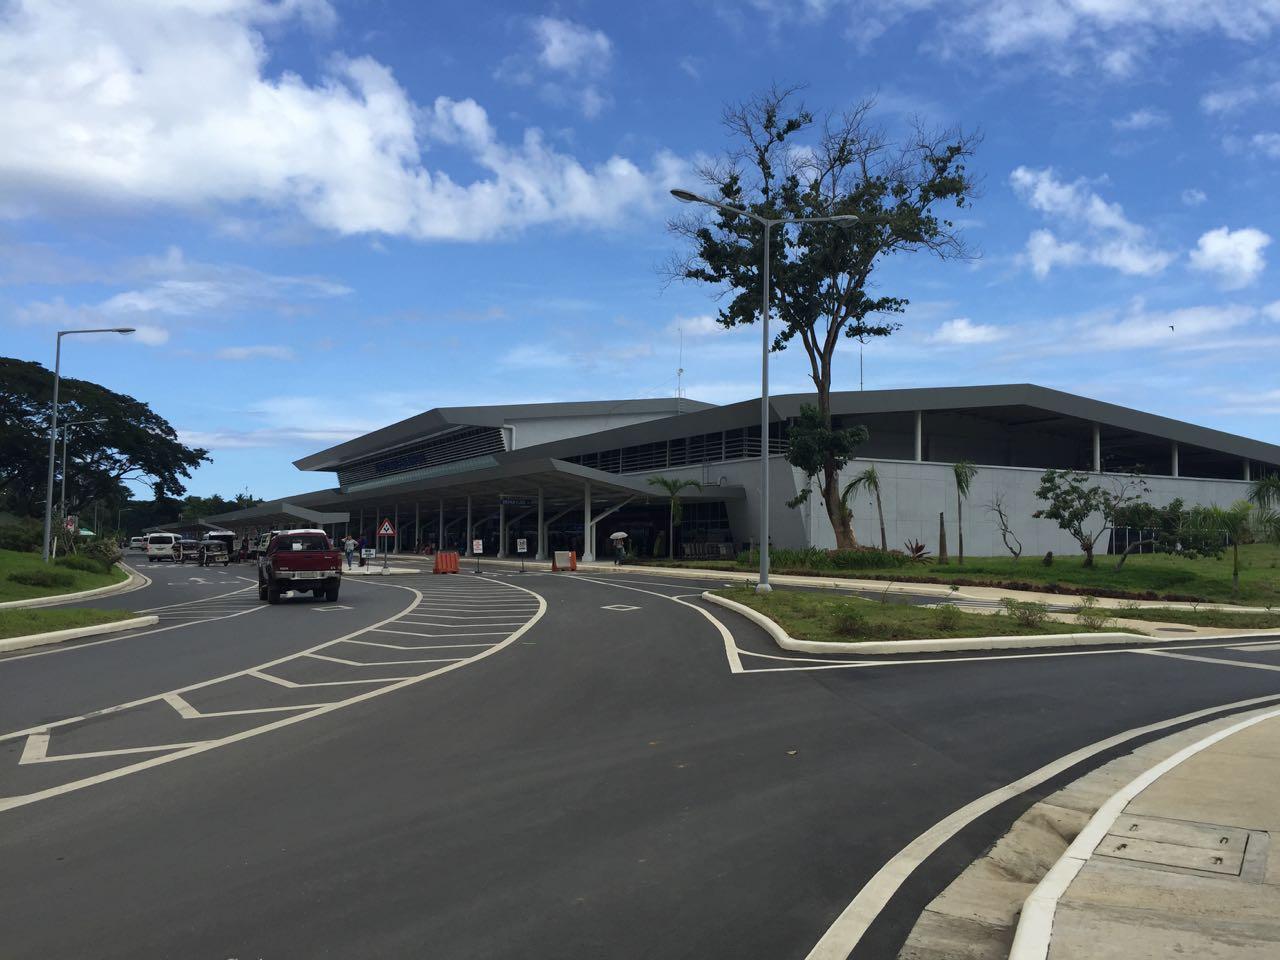 Aeroporto Puerto Princesa